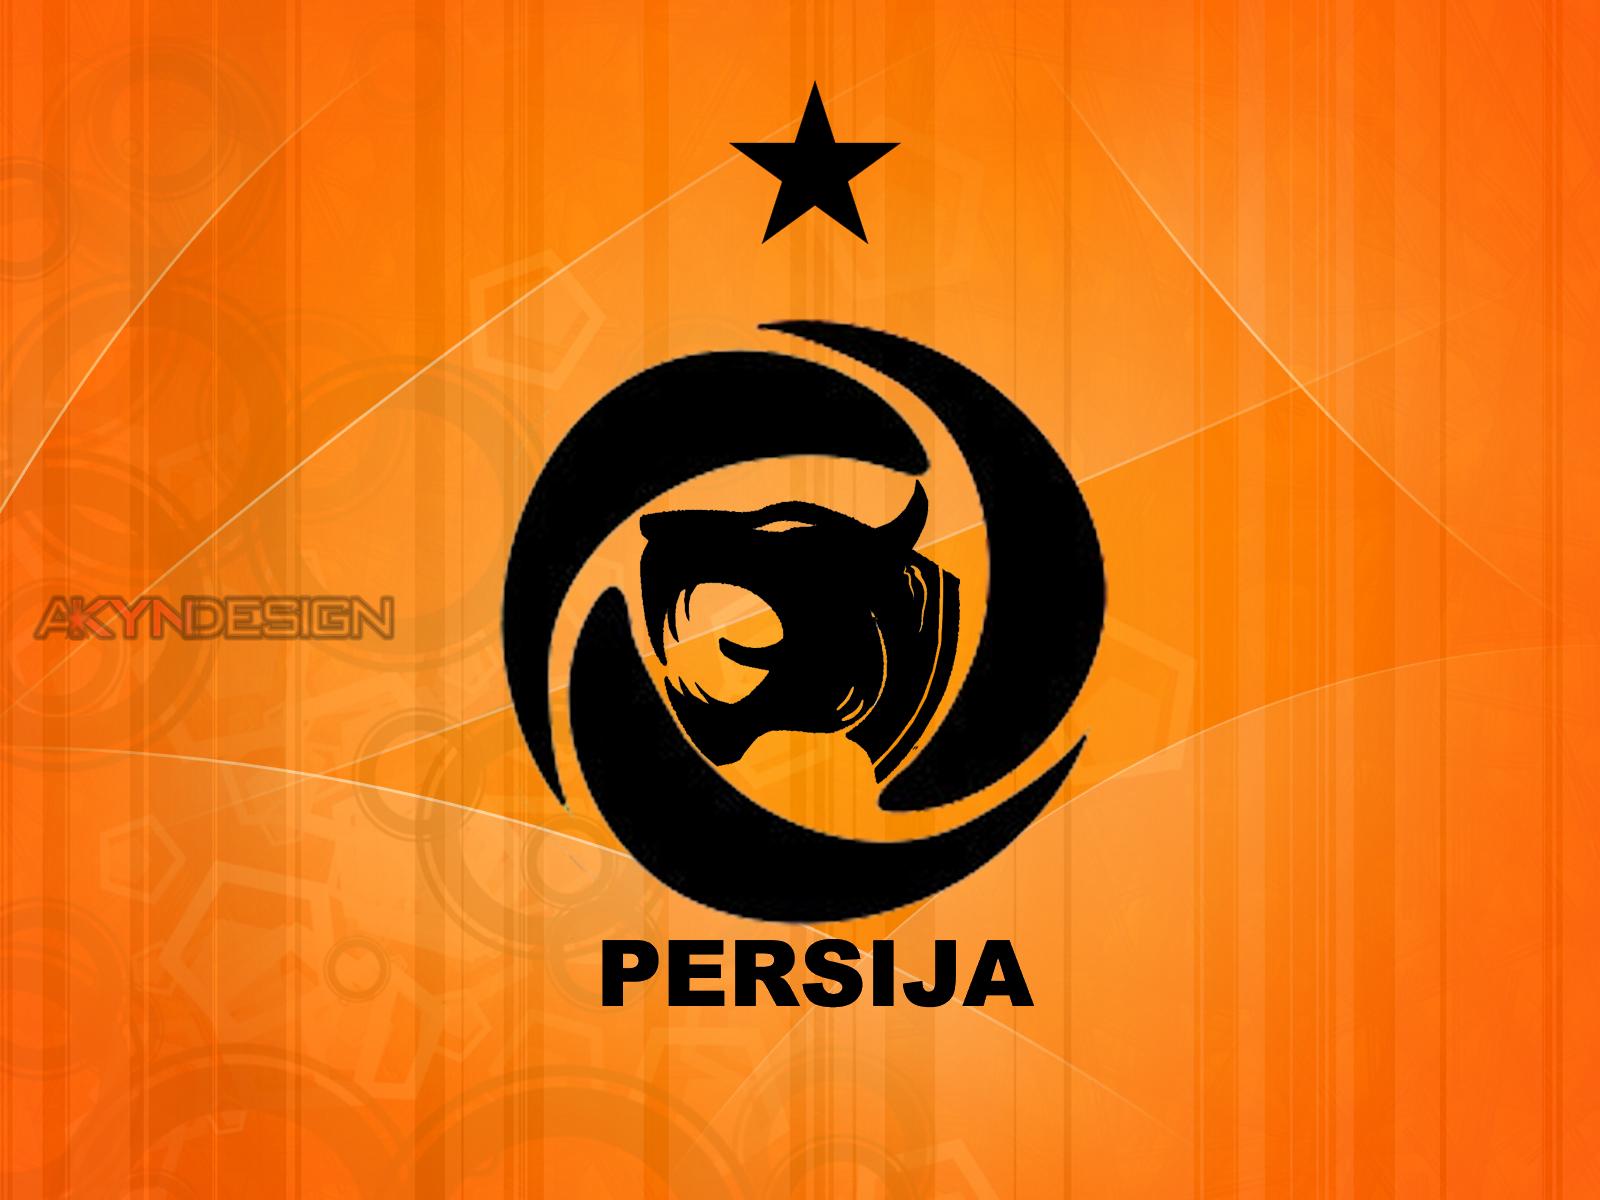 57 Download Download Logo Persija Cdr Psd 2019